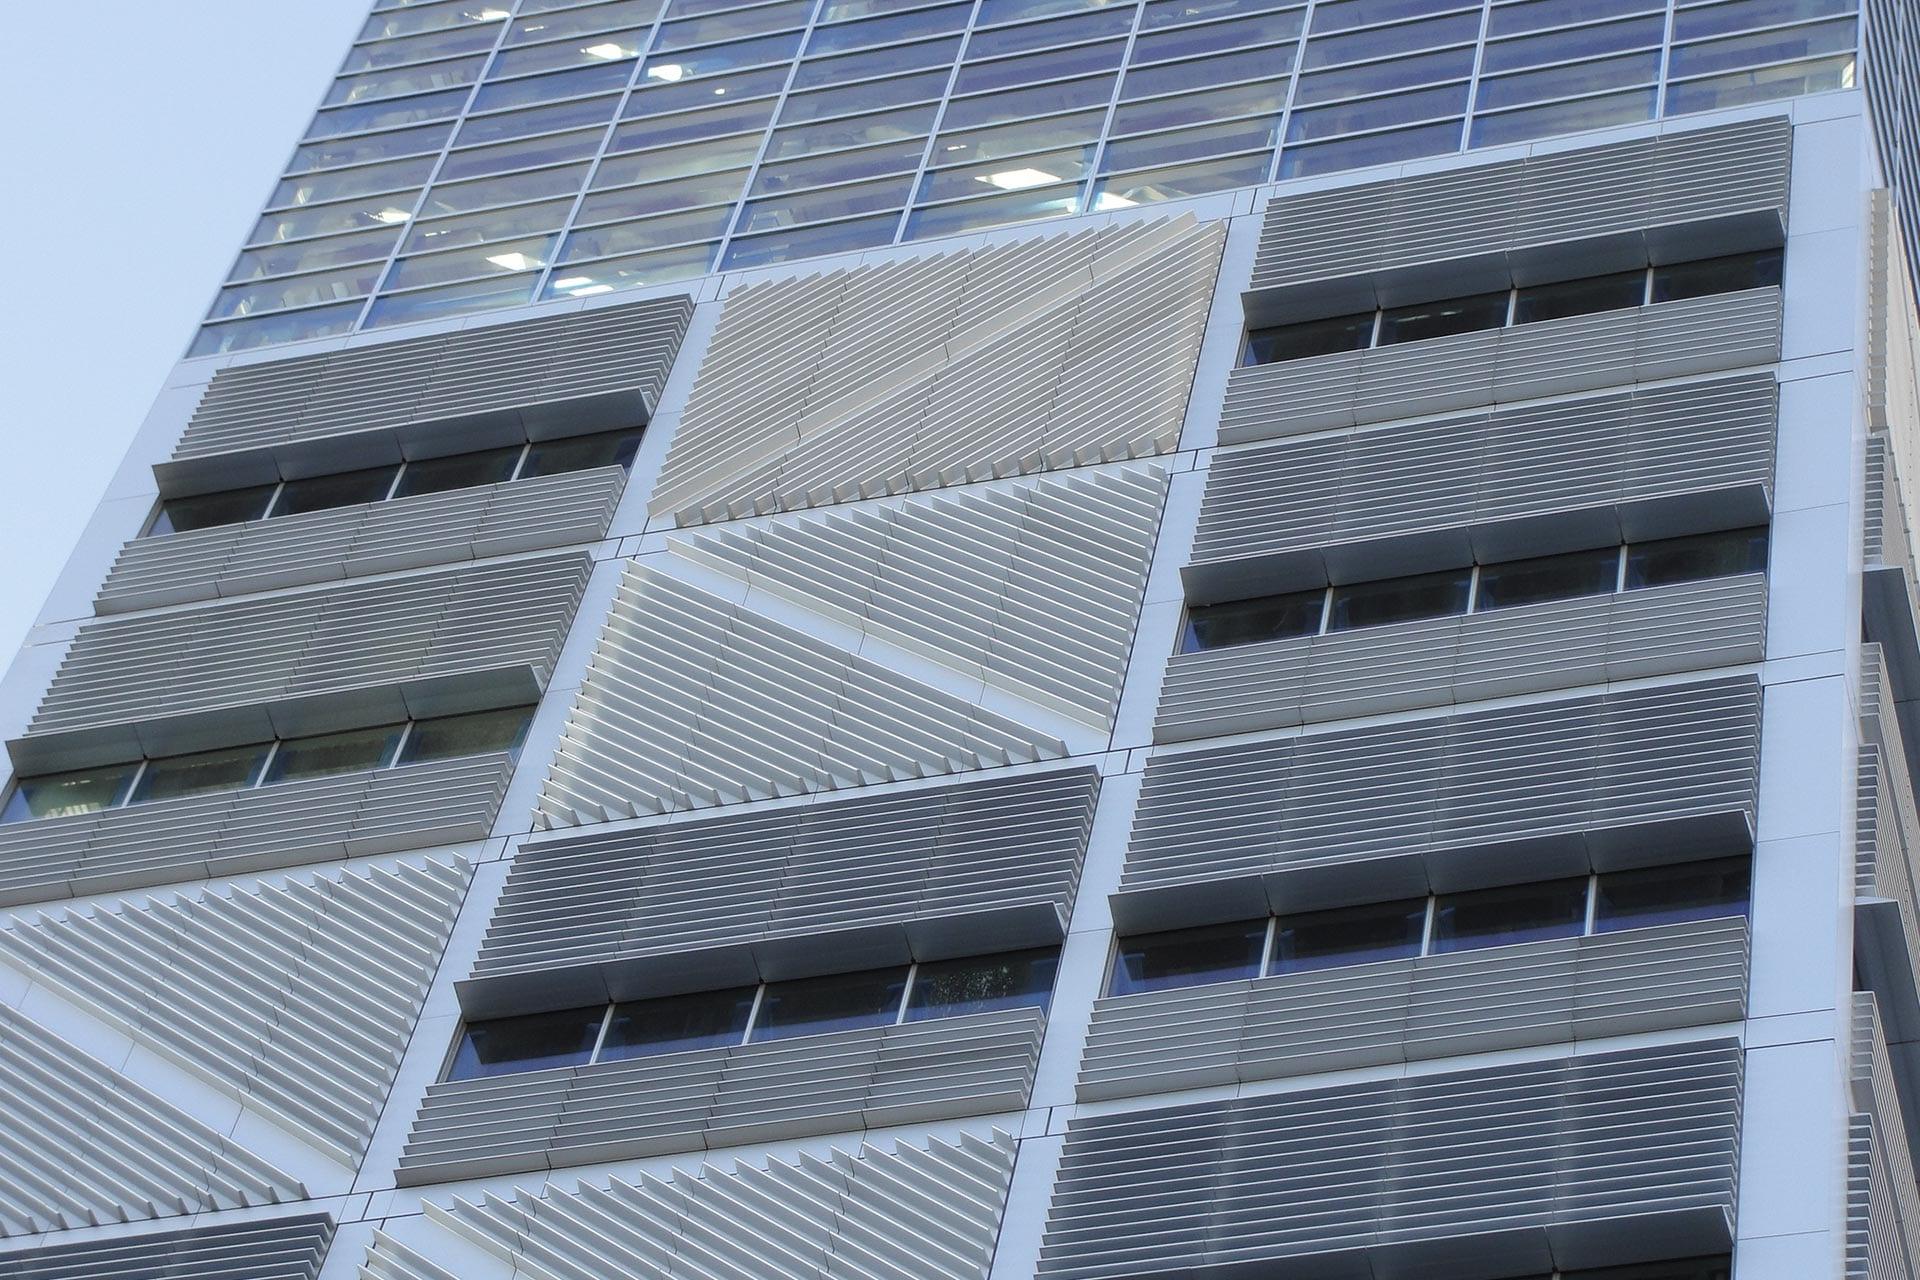 Detail of the aluminum facade system used on Columbia University Northwest Corner Building.